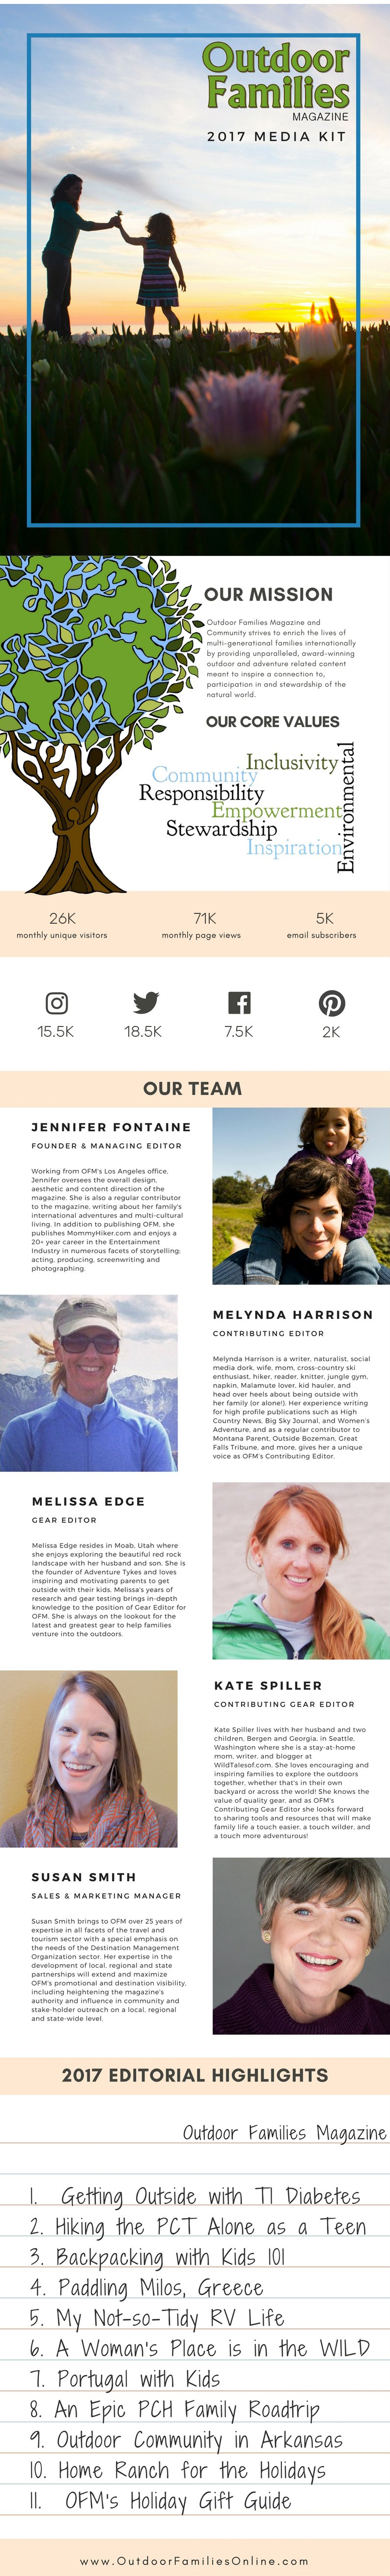 Outdoor Families Magazine 2017 media kit